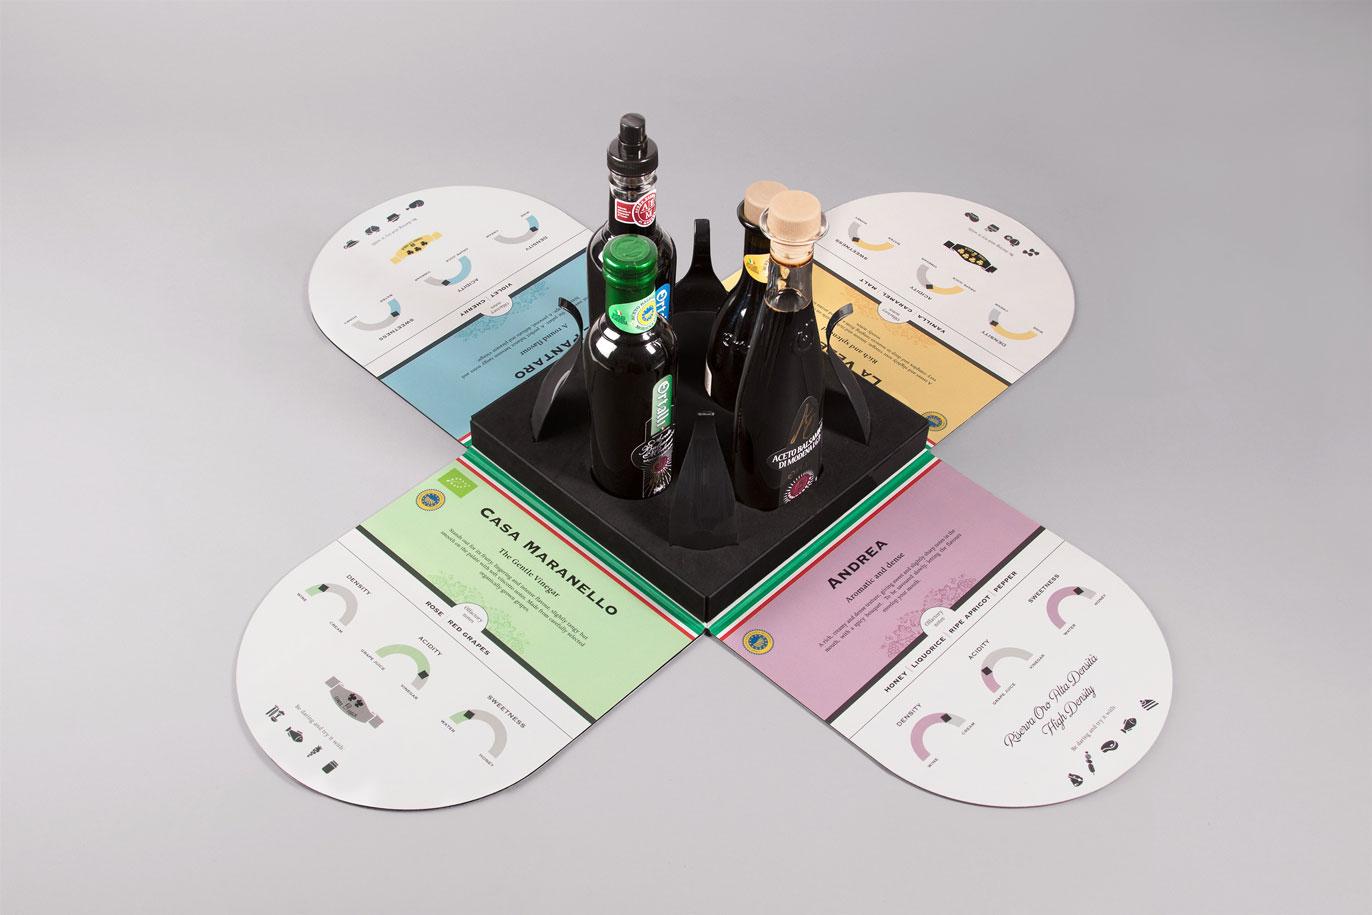 Ortalli packaging selling kit creatividad diseño gráfico nuevos formatos Vibranding